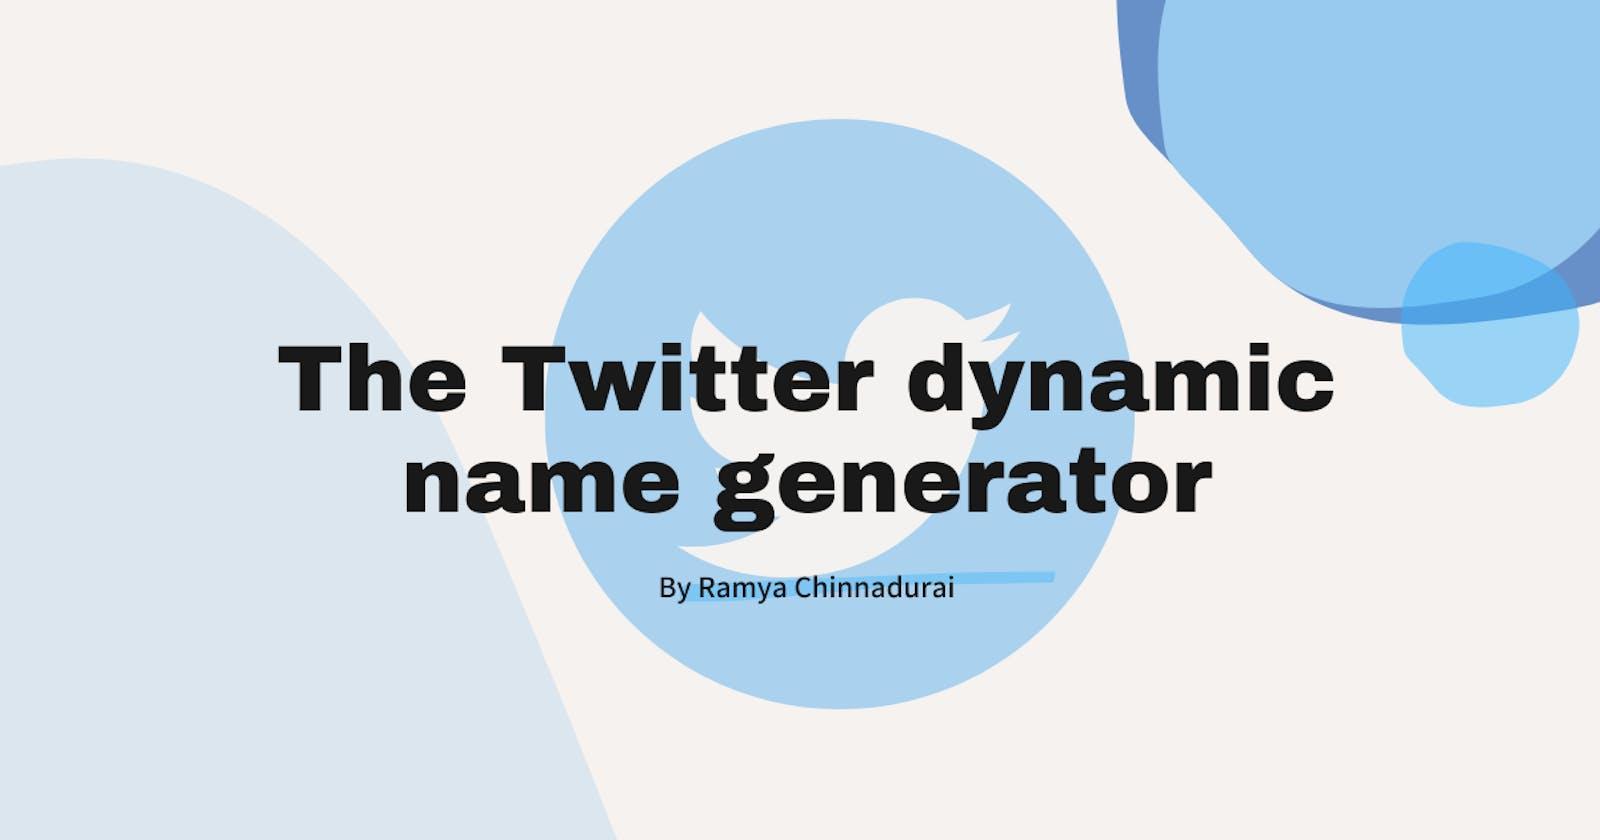 The Twitter dynamic name generator